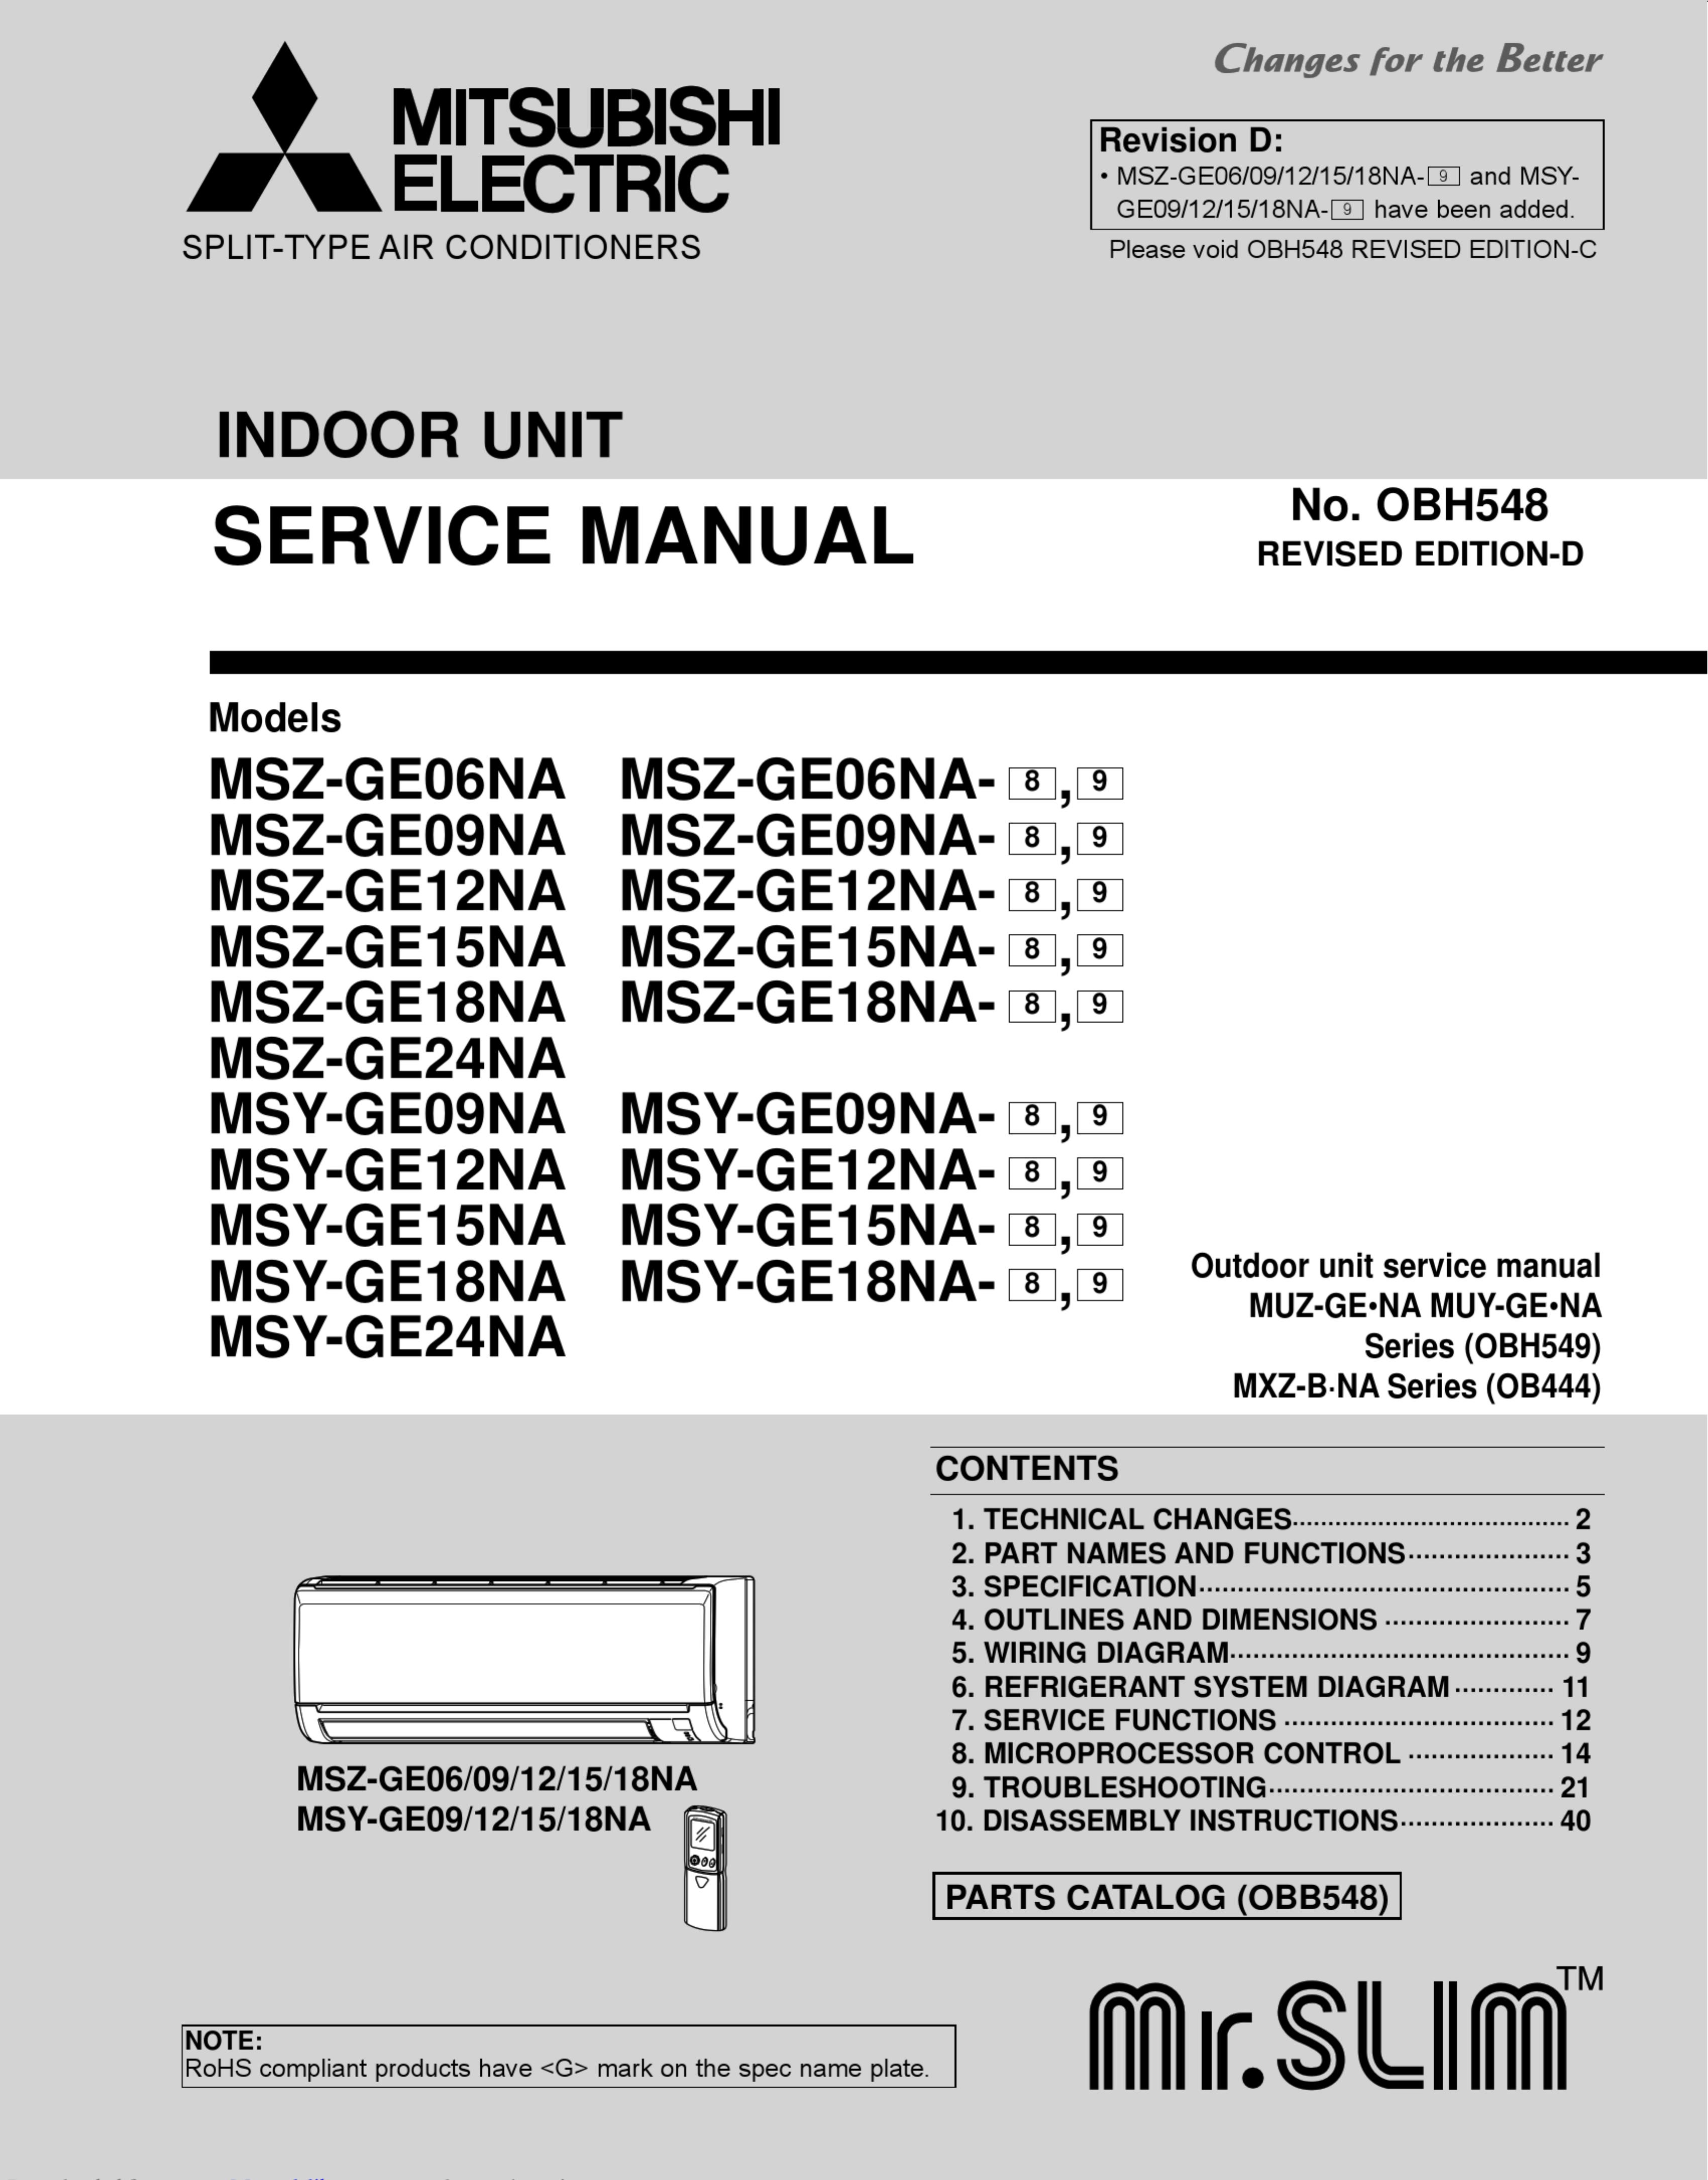 Mitsubishi Electric Msz Ge09na Service Manual 1003213 User Wiring Diagram